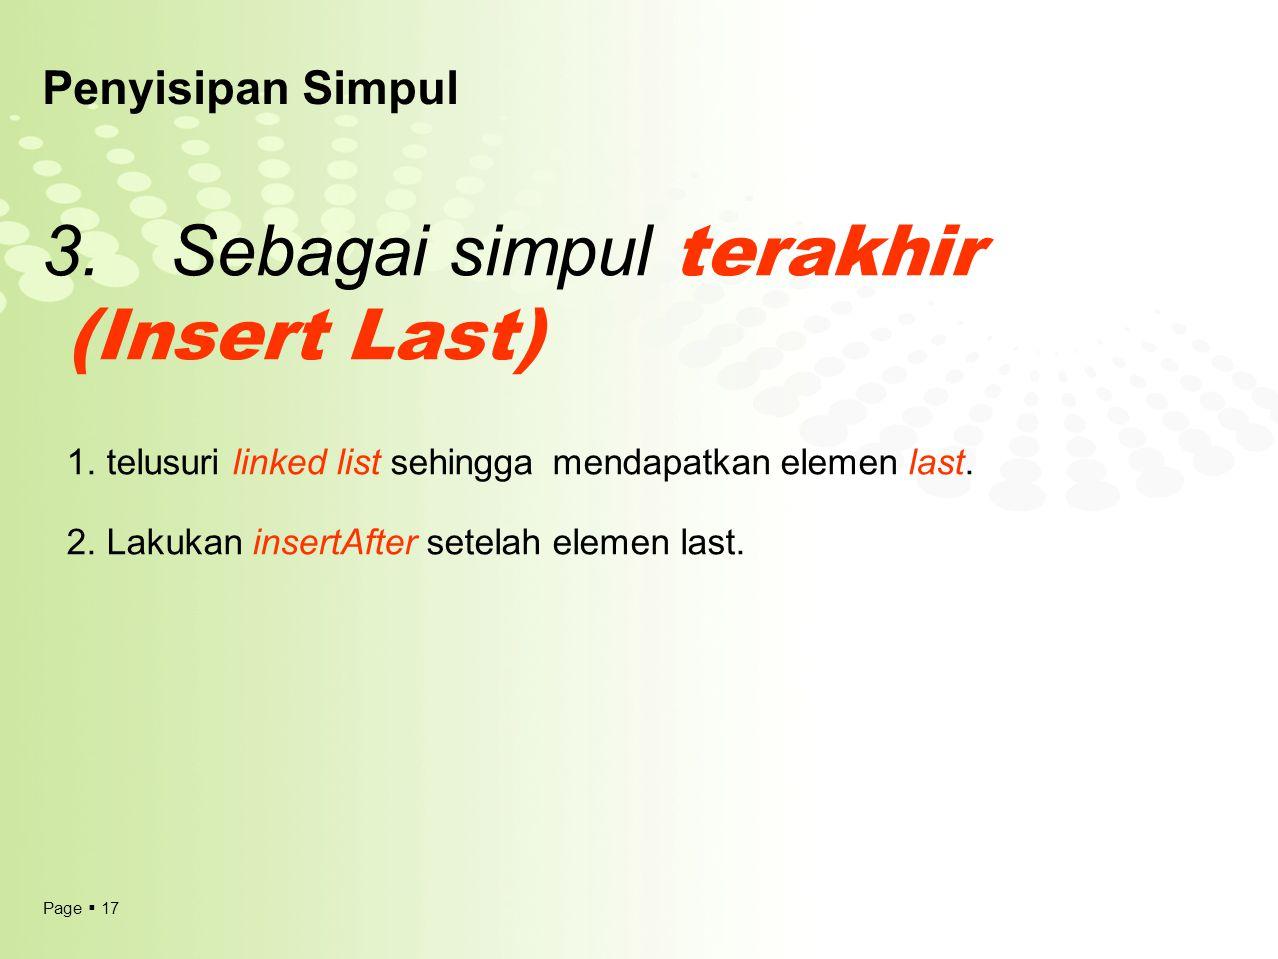 Page  17 Penyisipan Simpul 3. Sebagai simpul terakhir (Insert Last) 1. telusuri linked list sehingga mendapatkan elemen last. 2. Lakukan insertAfter